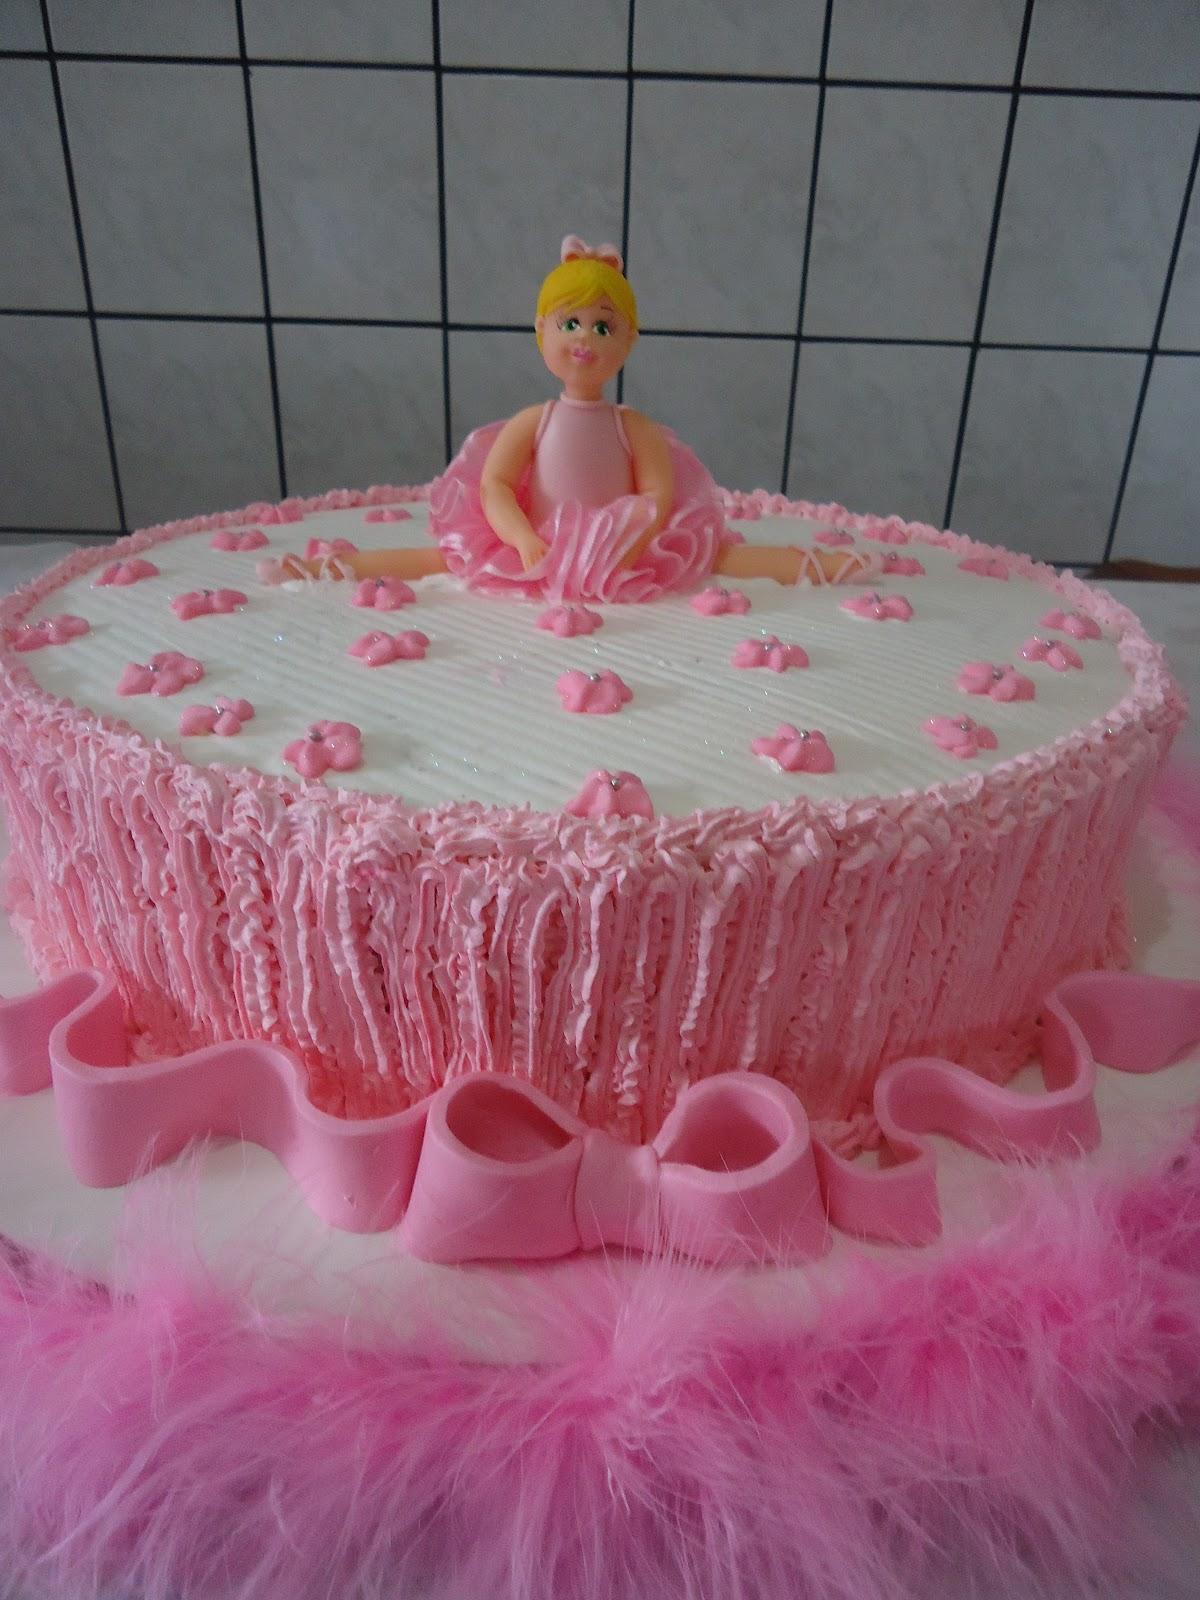 bolos de glace bailarina